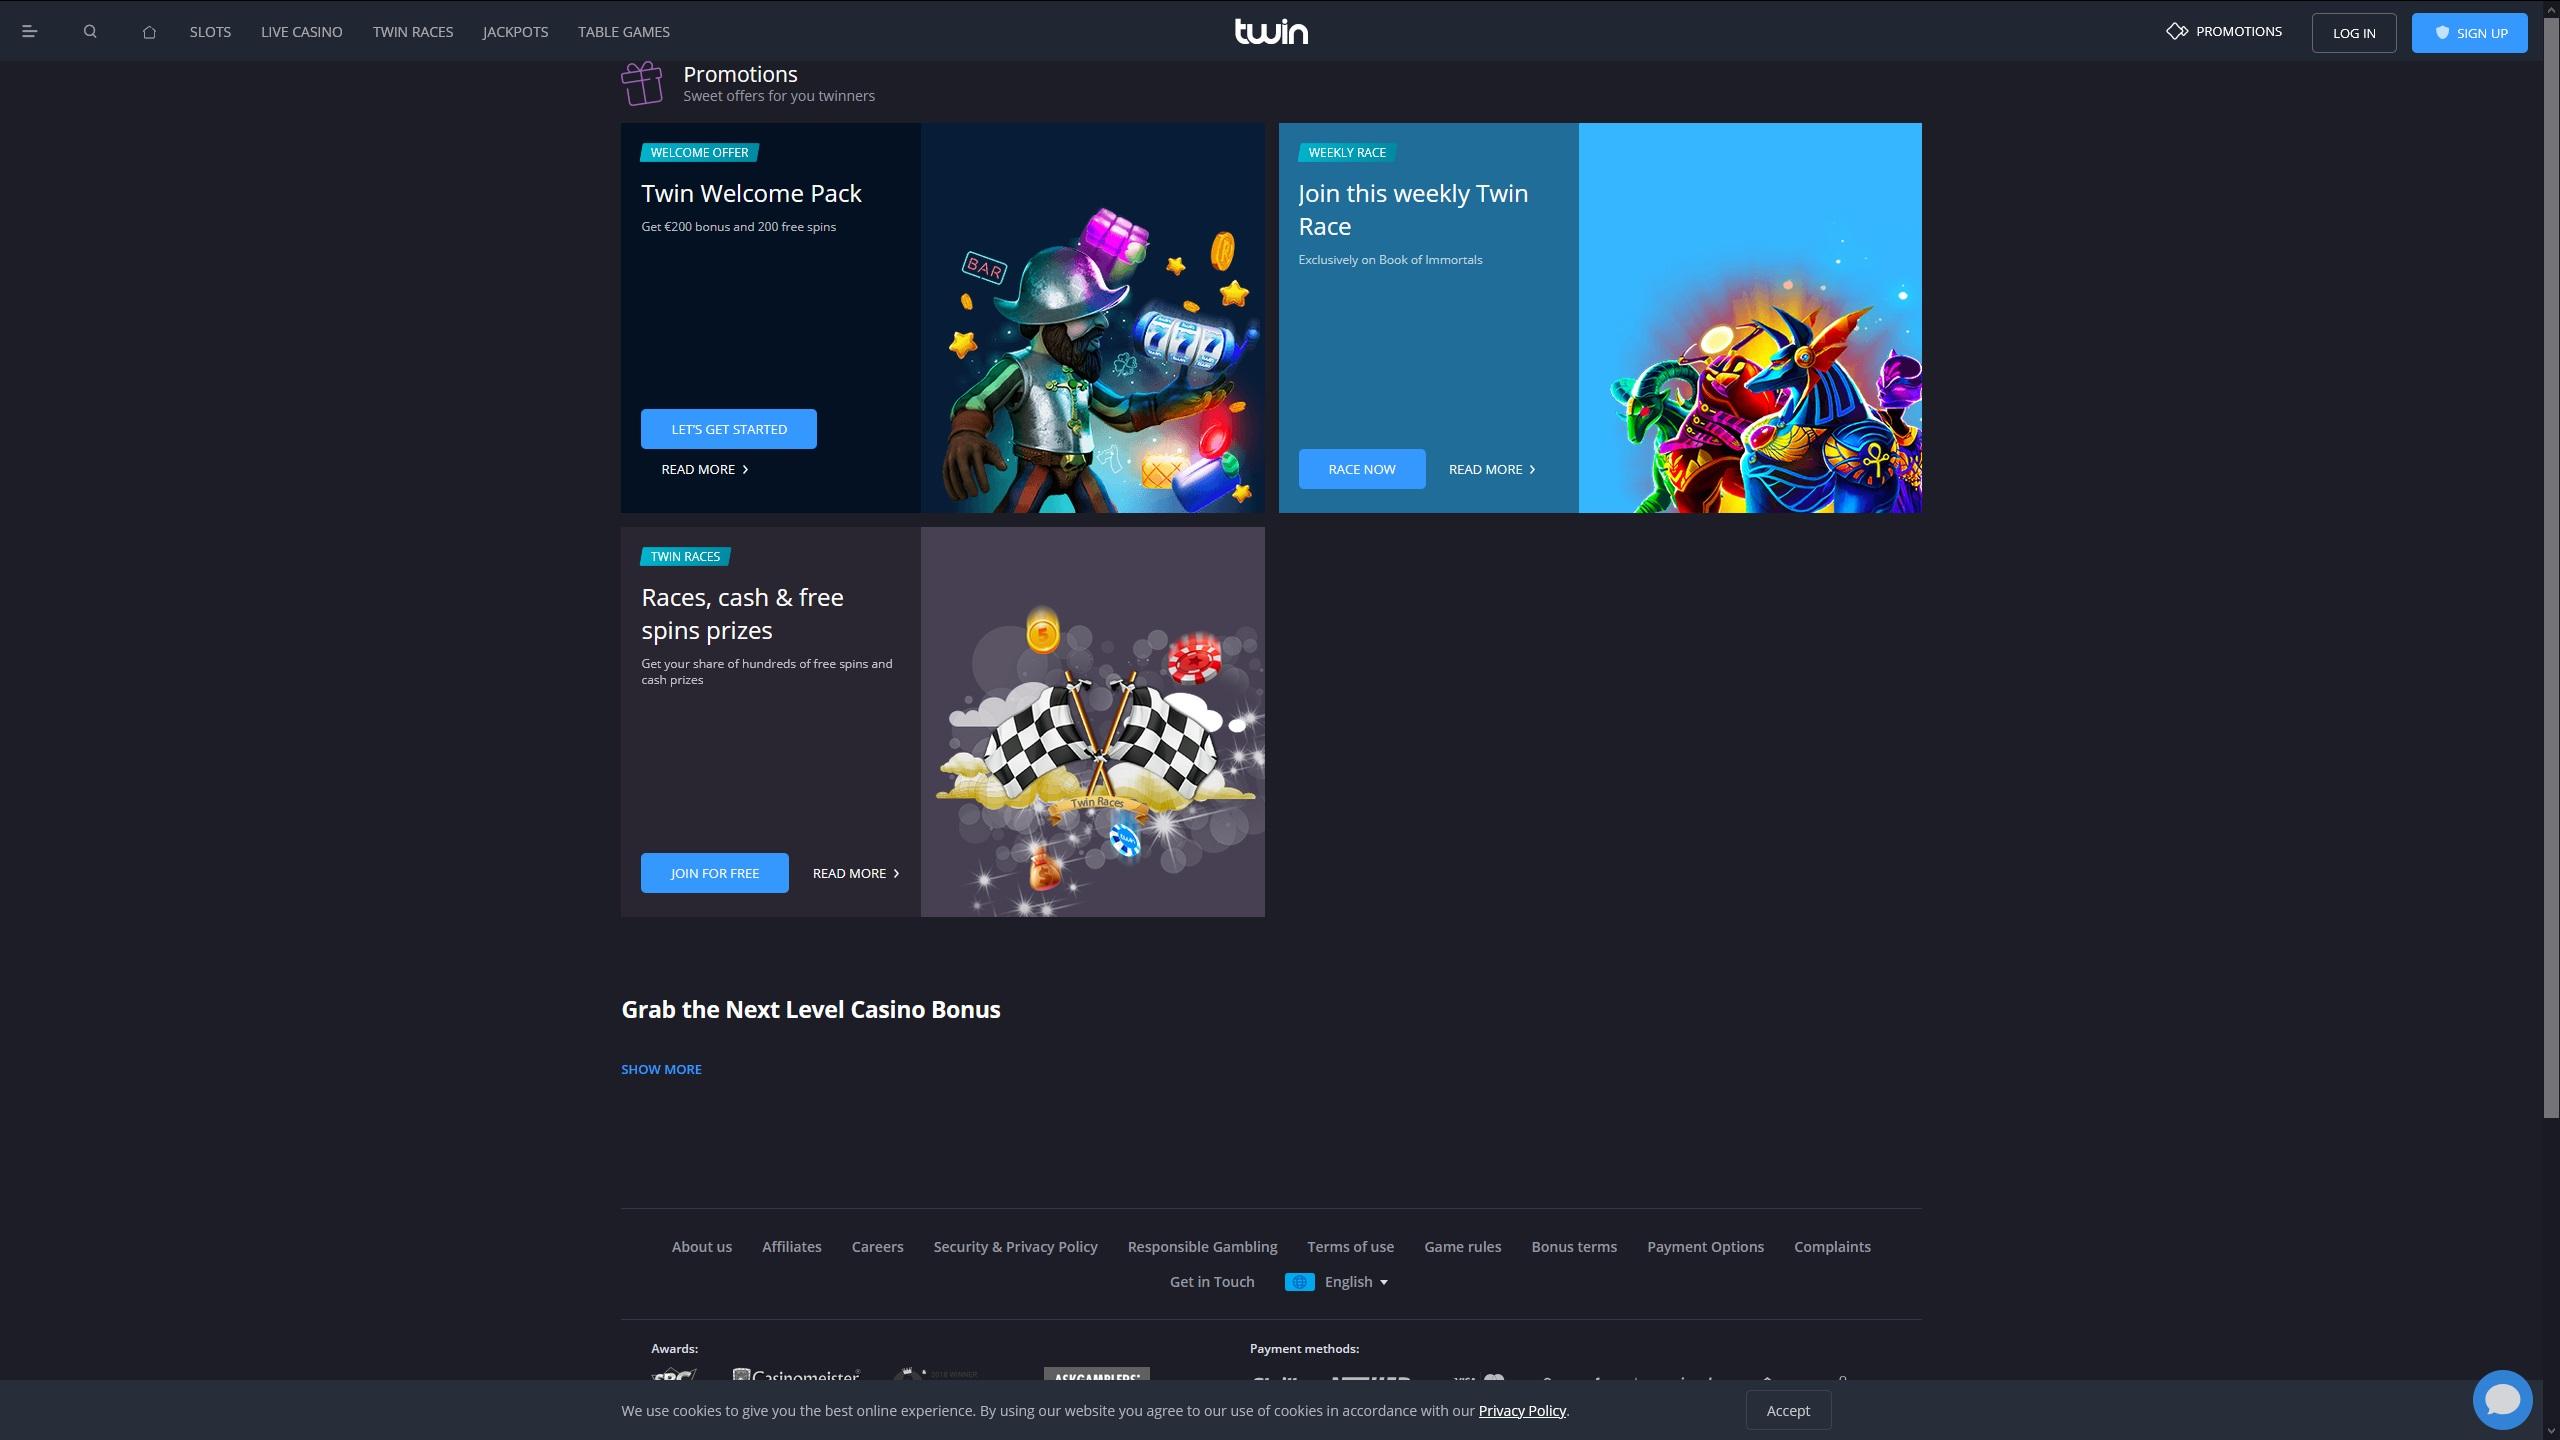 Claim Online Casino Promotion